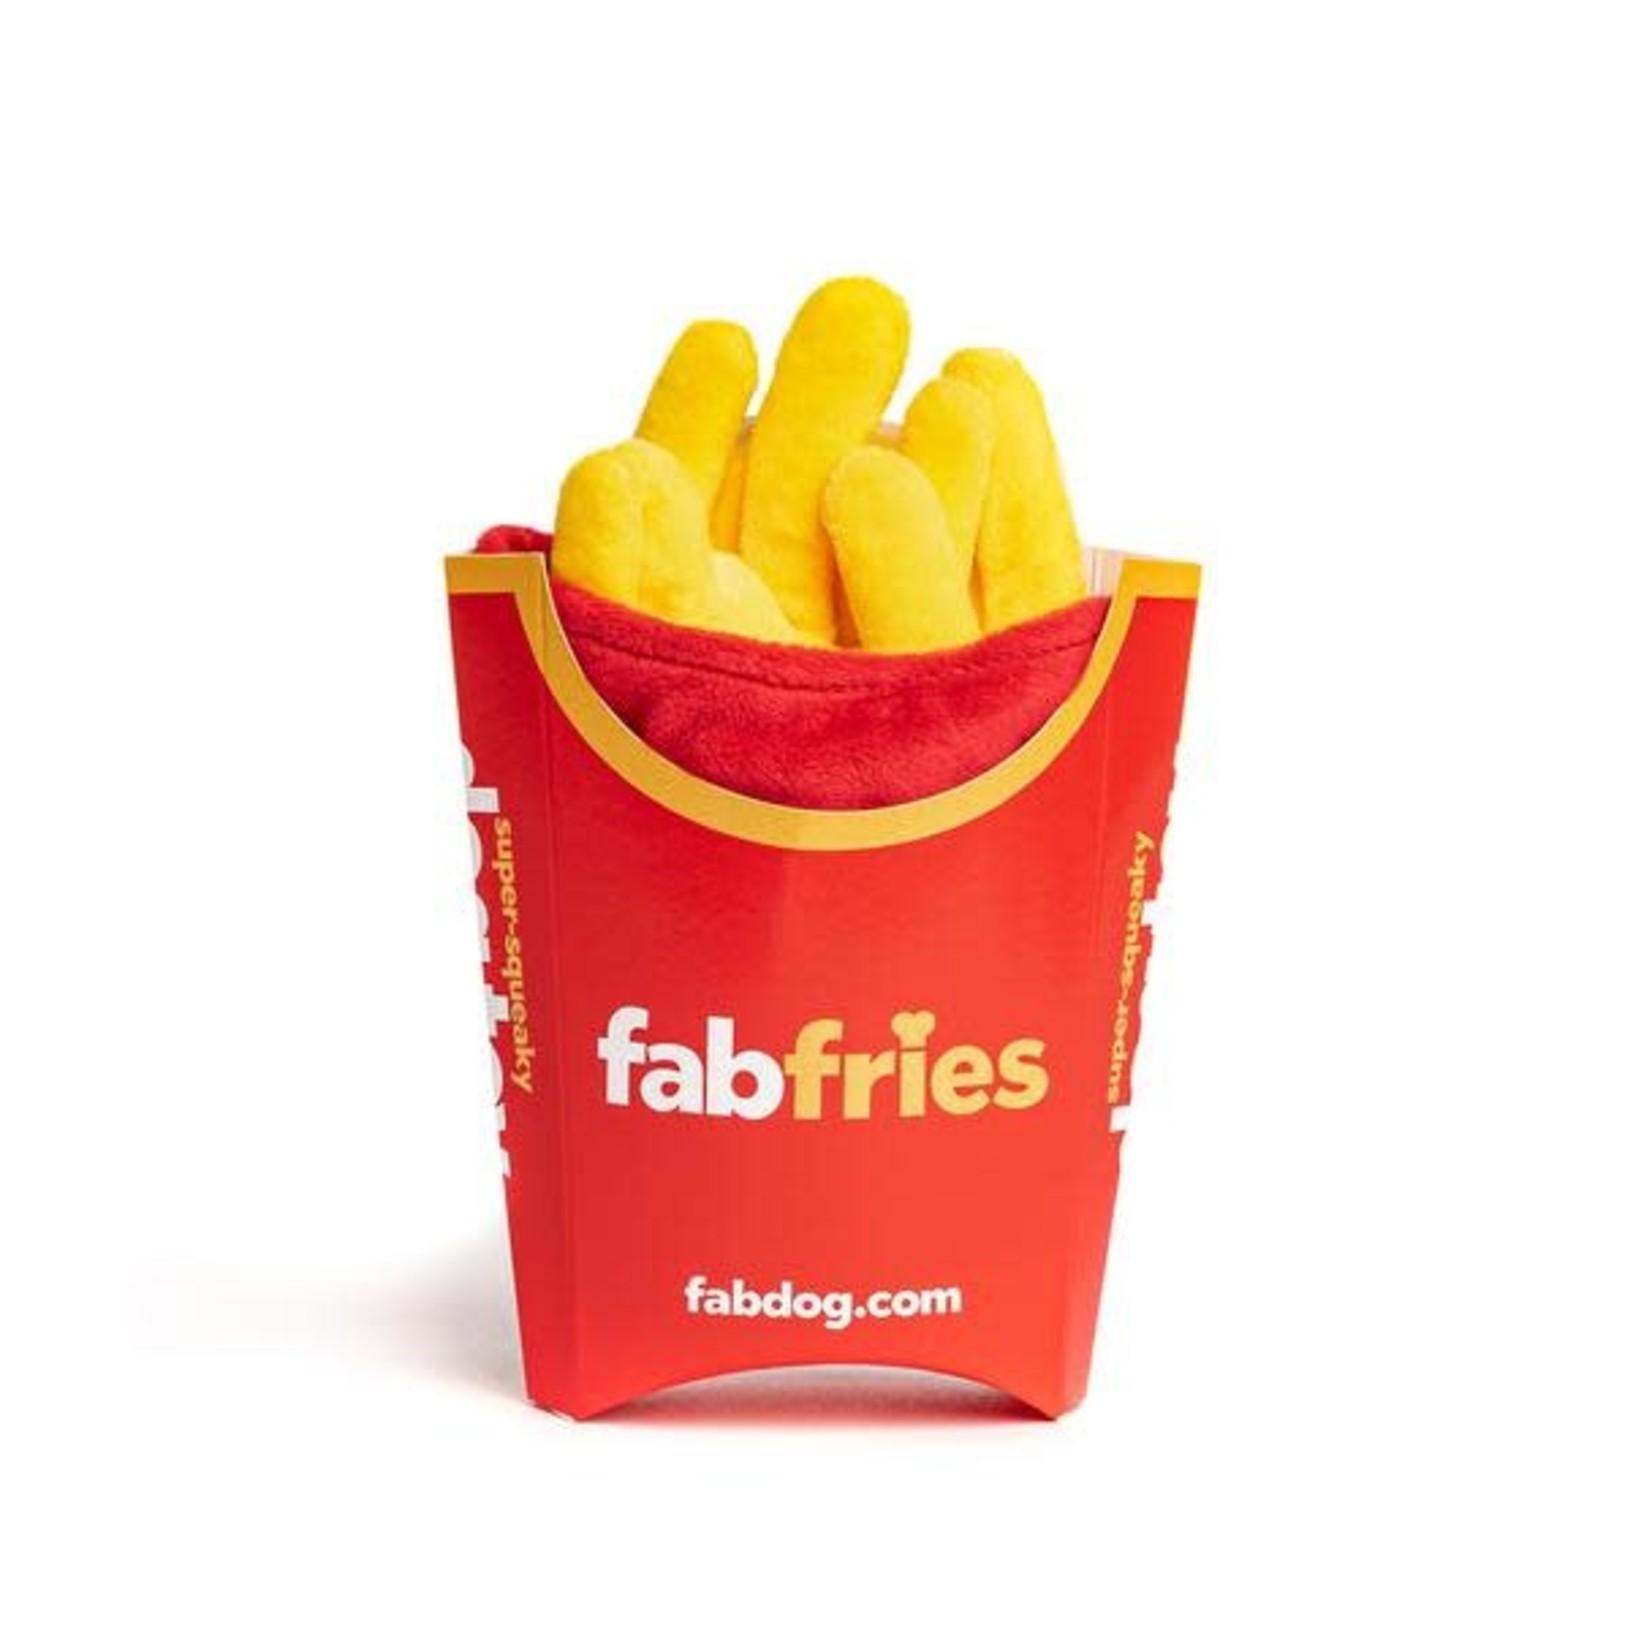 Fab Dog FAB DOG Super Squeaker French Fries